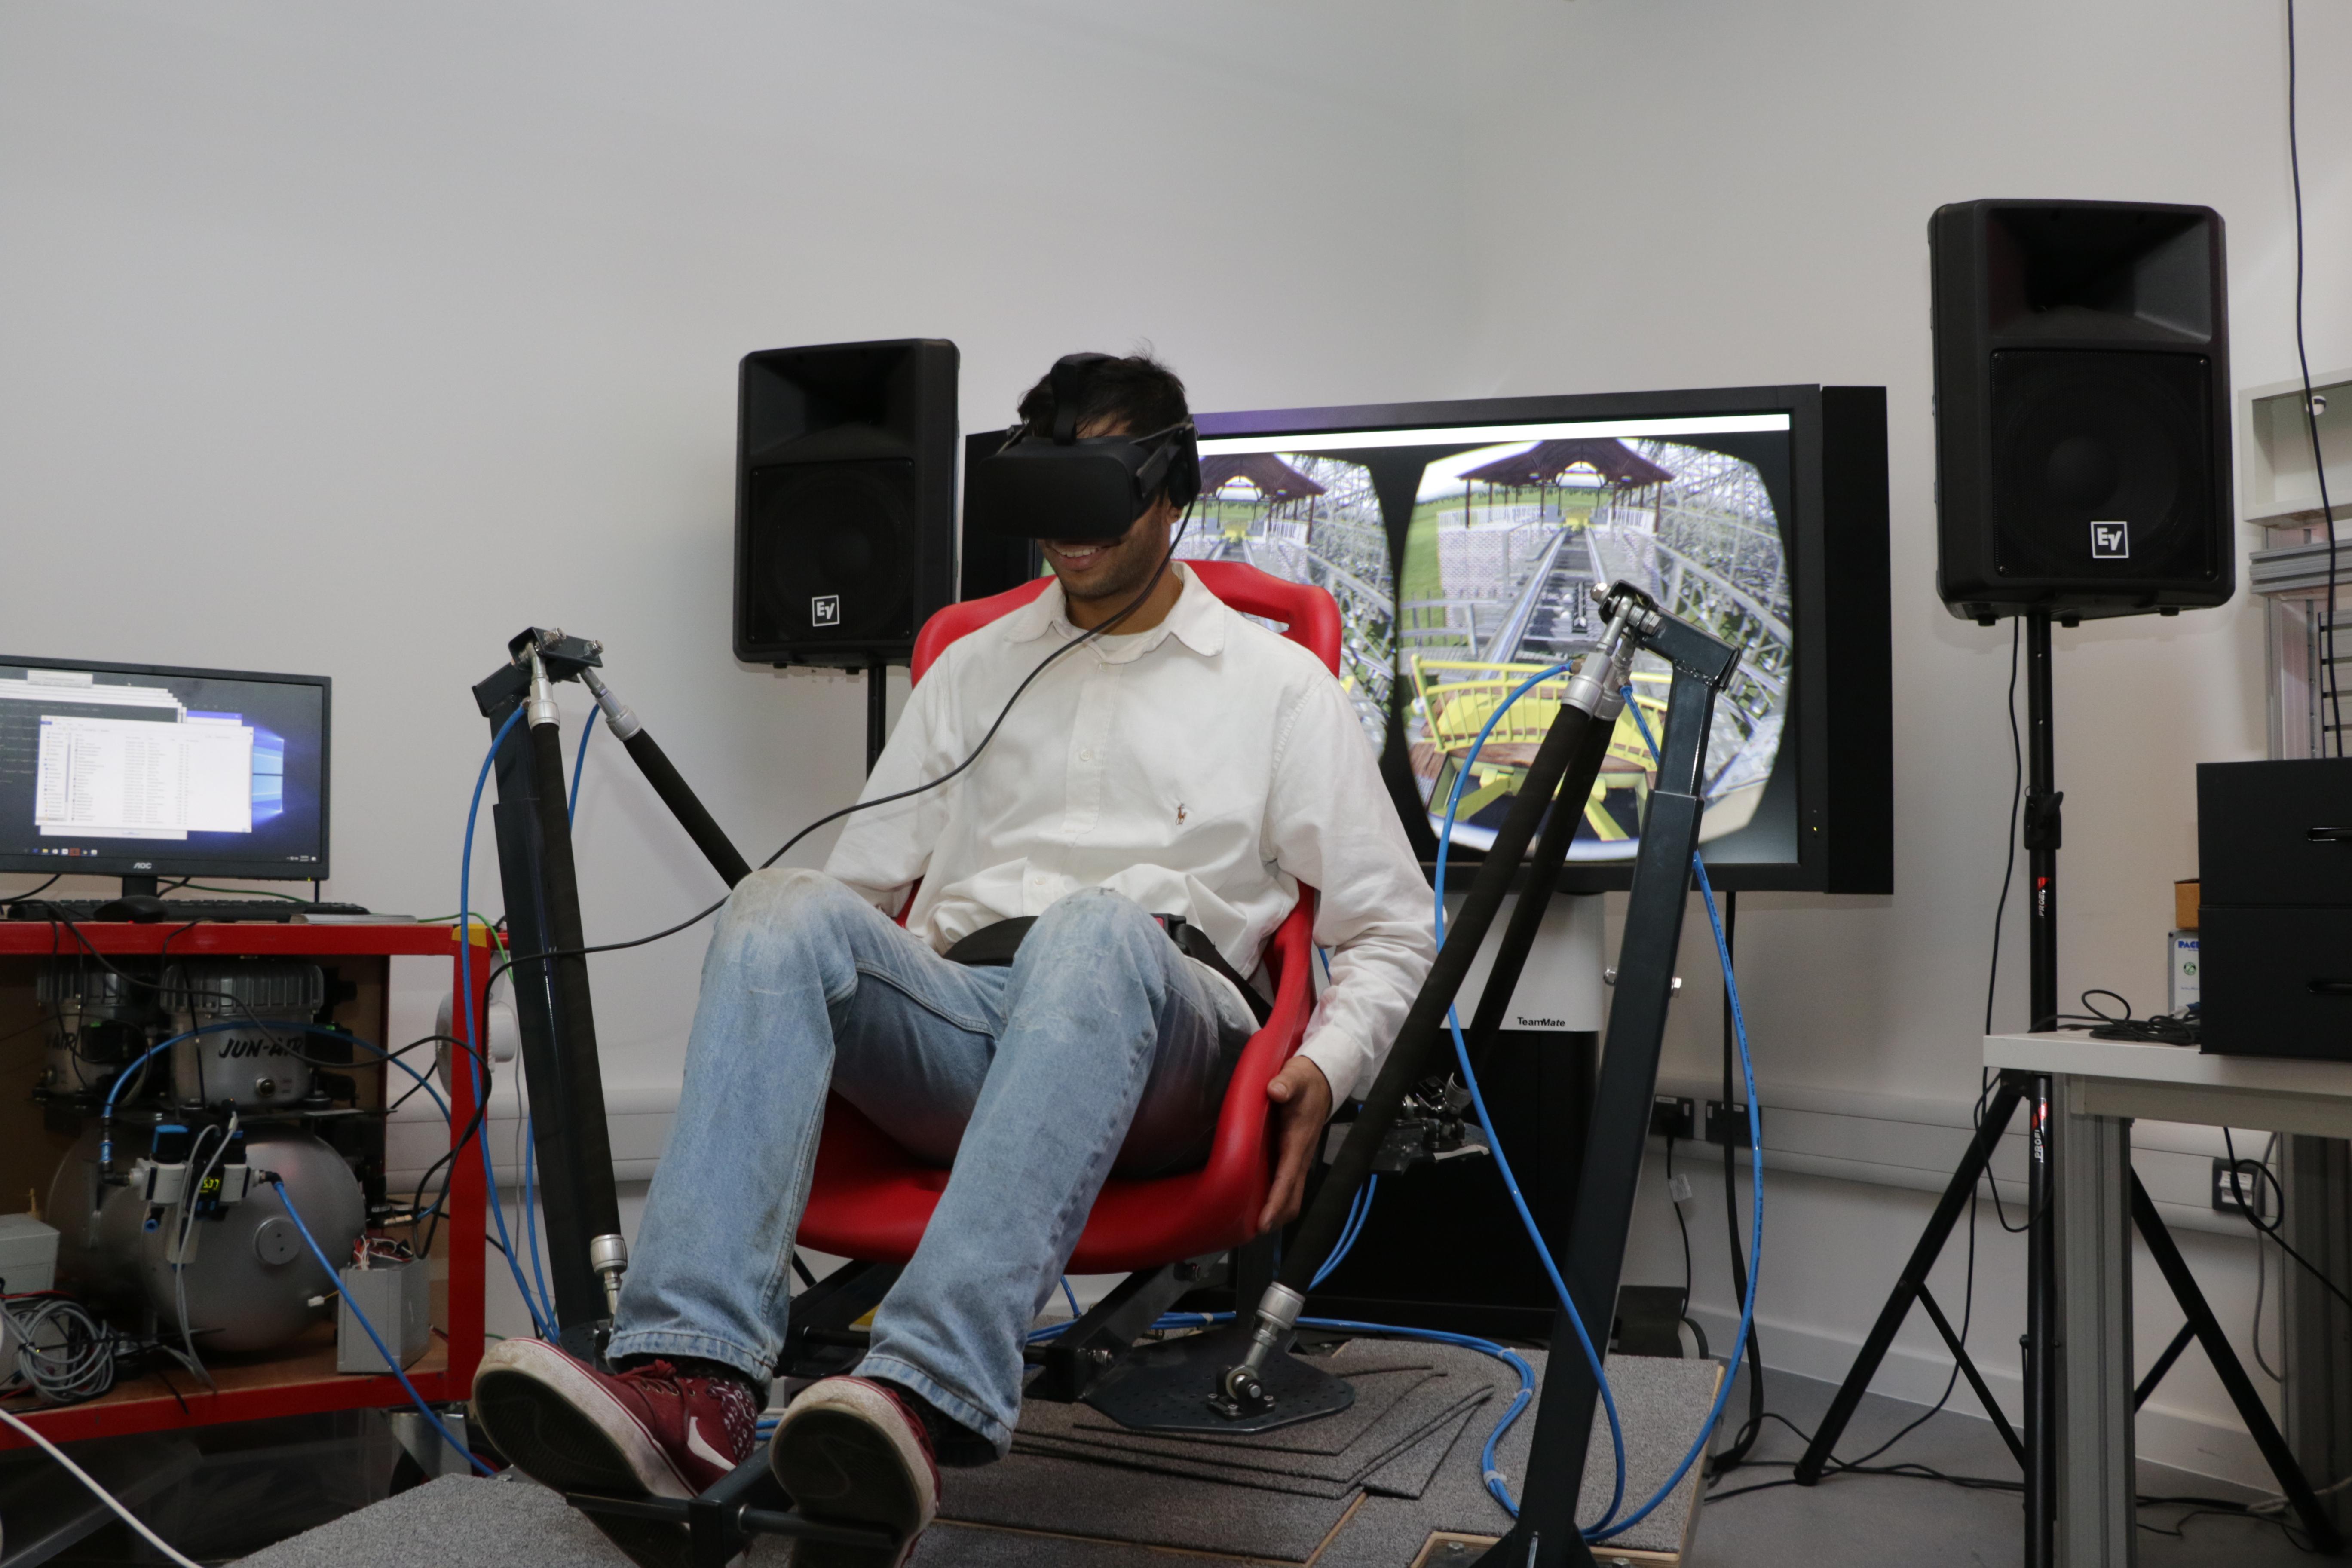 VR stimulation